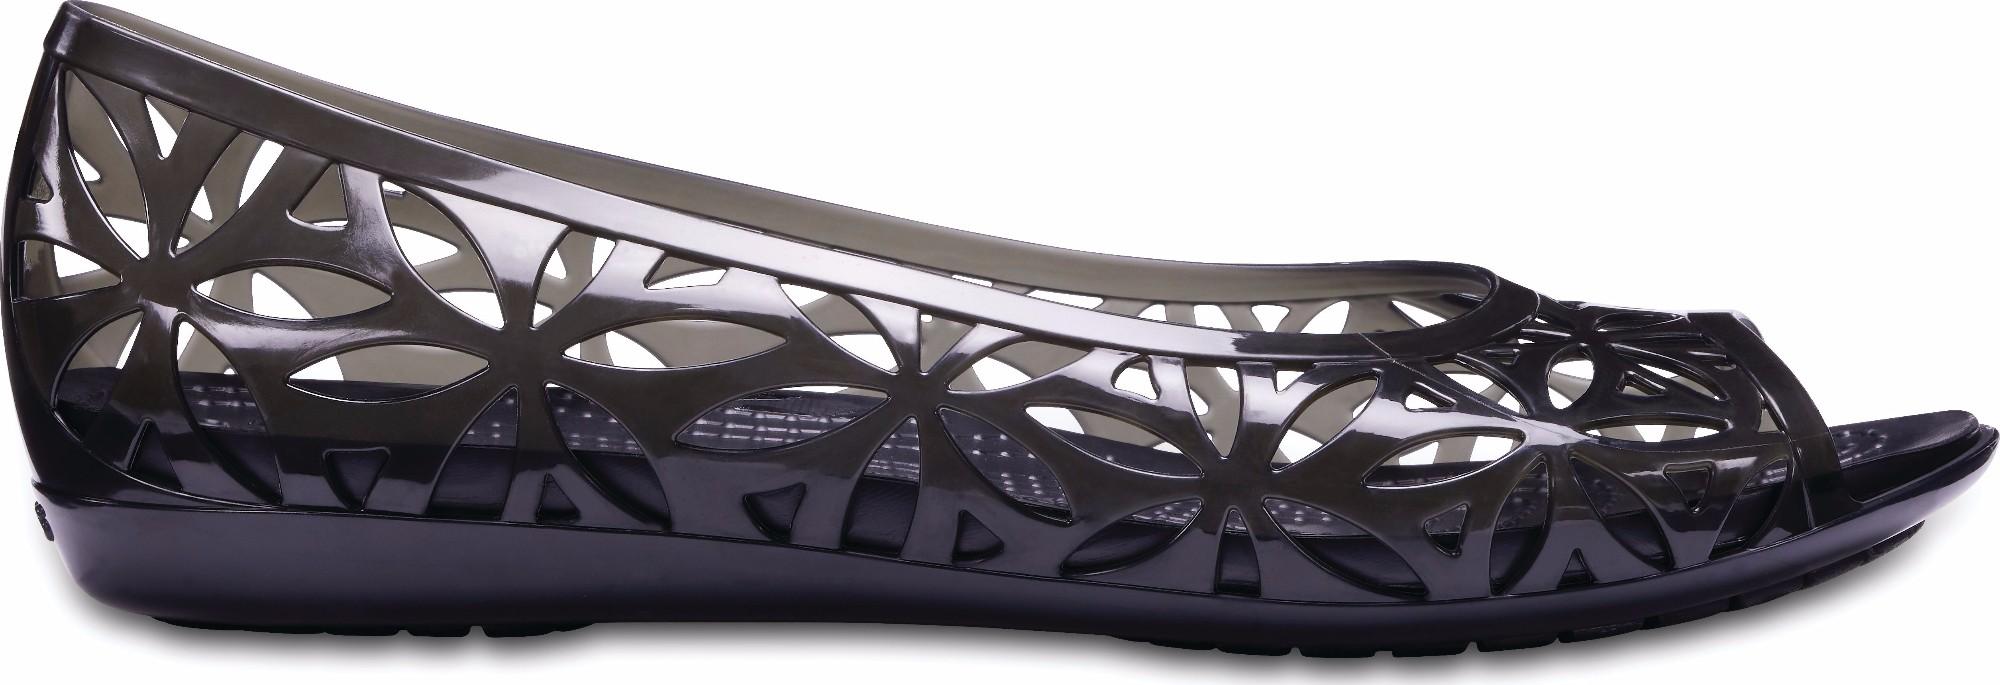 93b4833b881 Previous. Crocs™ Isabella Jelly II Flat Black Black ...